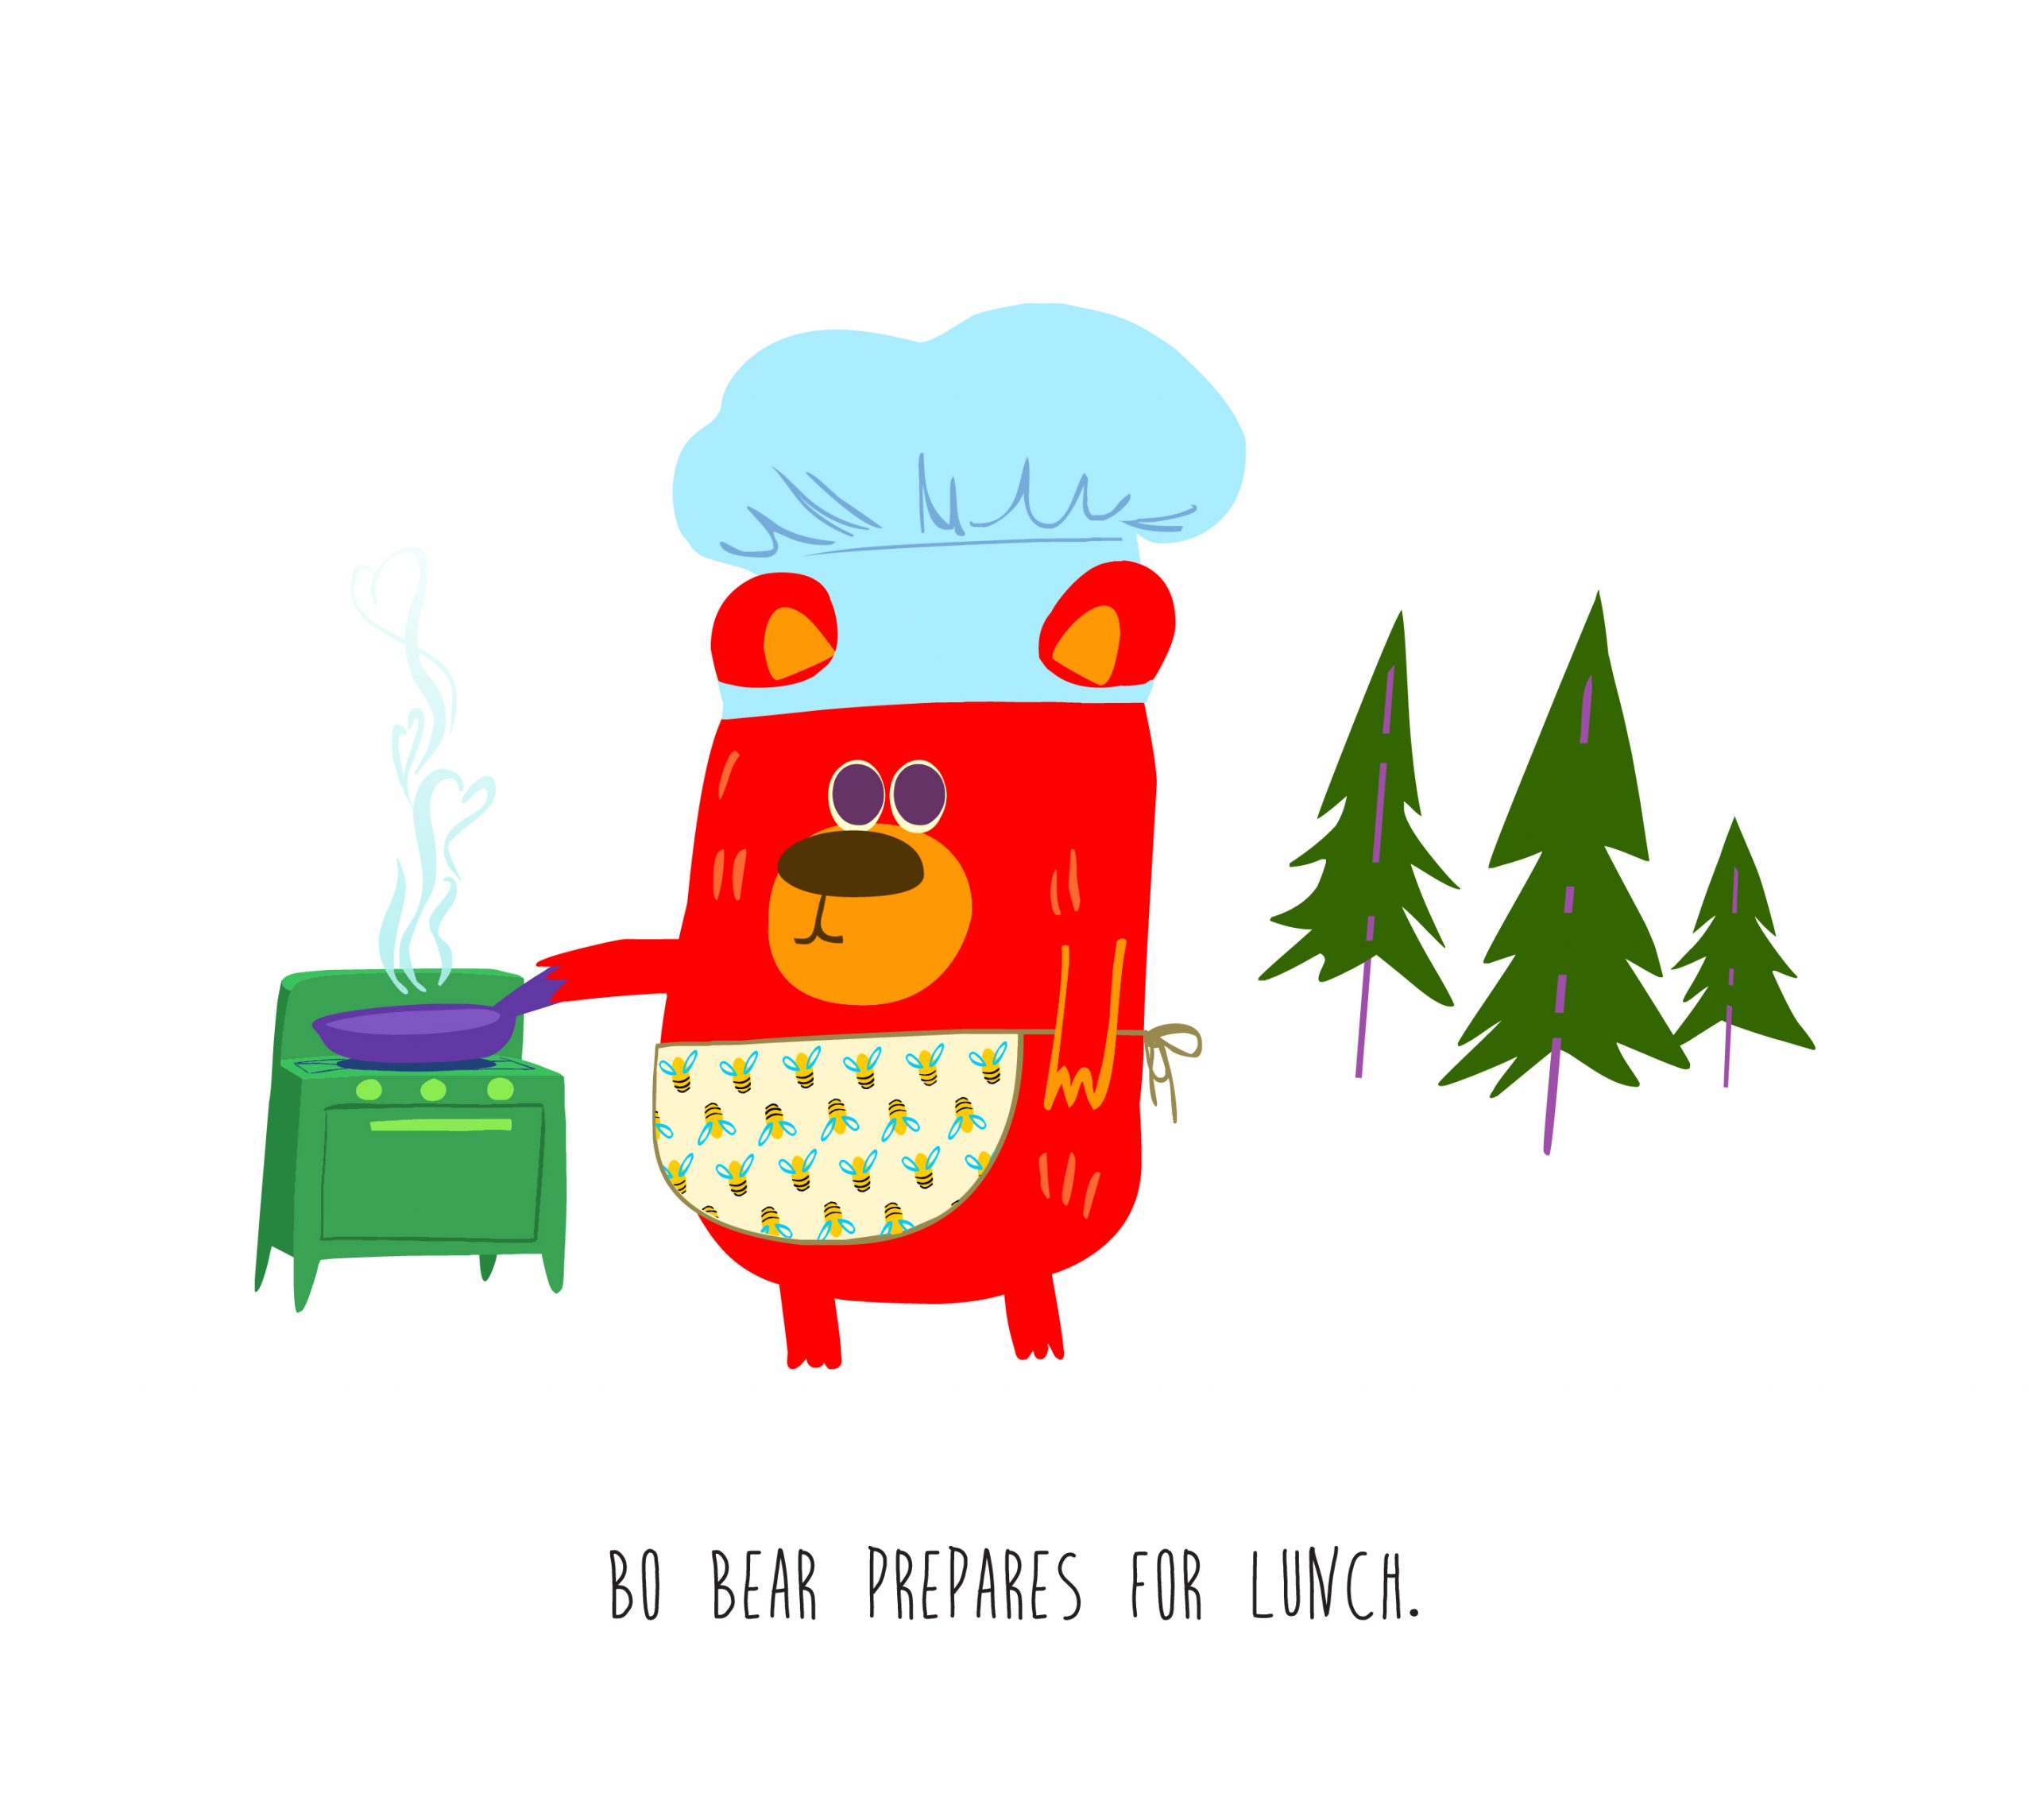 BoBear_Page_lunch